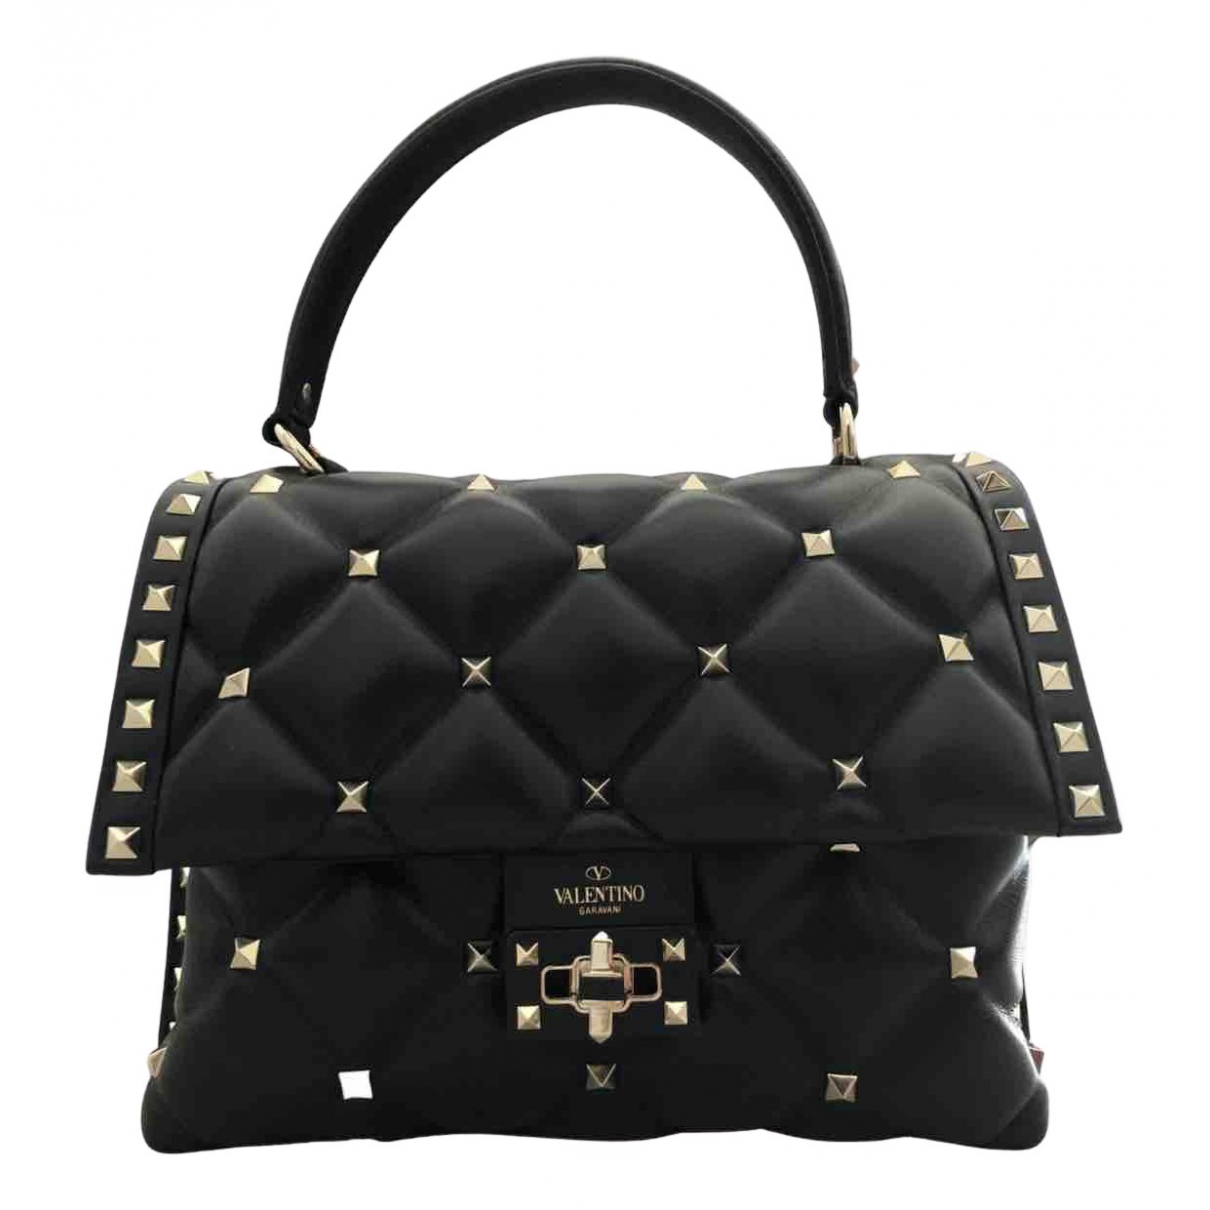 Valentino Garavani CandyStud Black Leather handbag for Women N